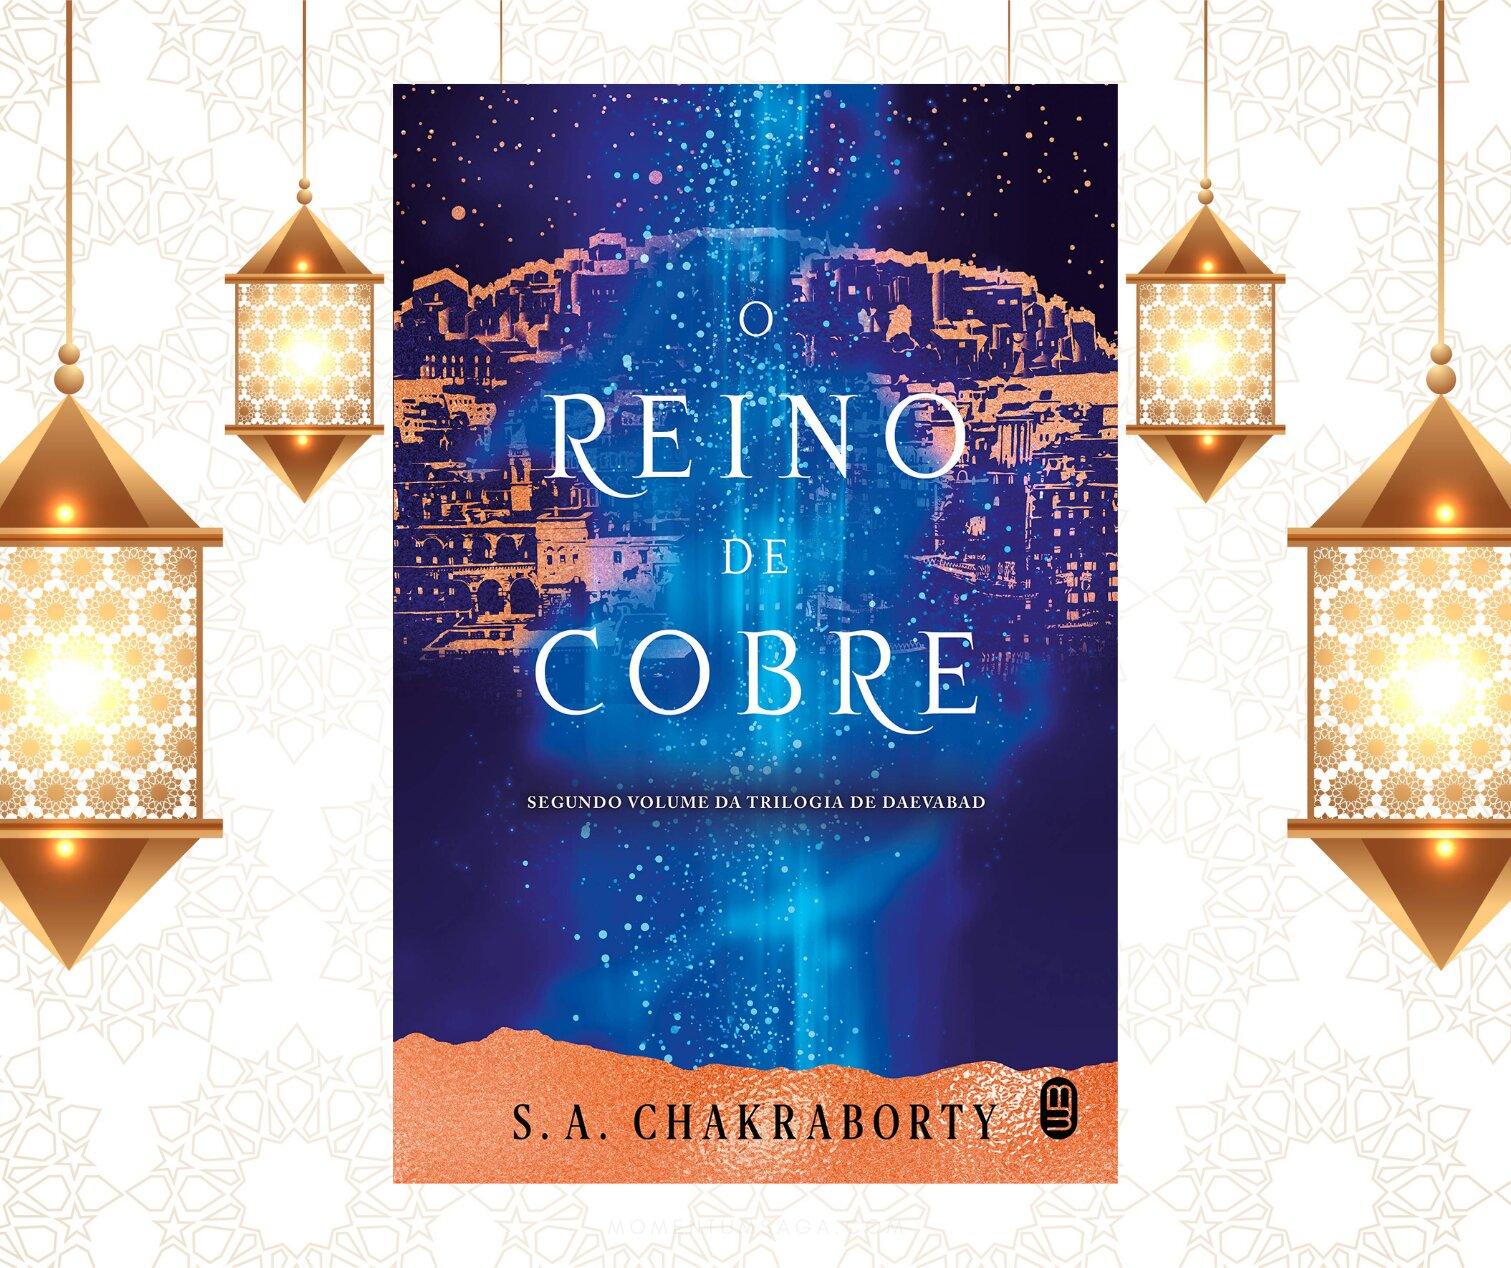 Resenha: O Reino de Cobre, de S. A. Chakraborty